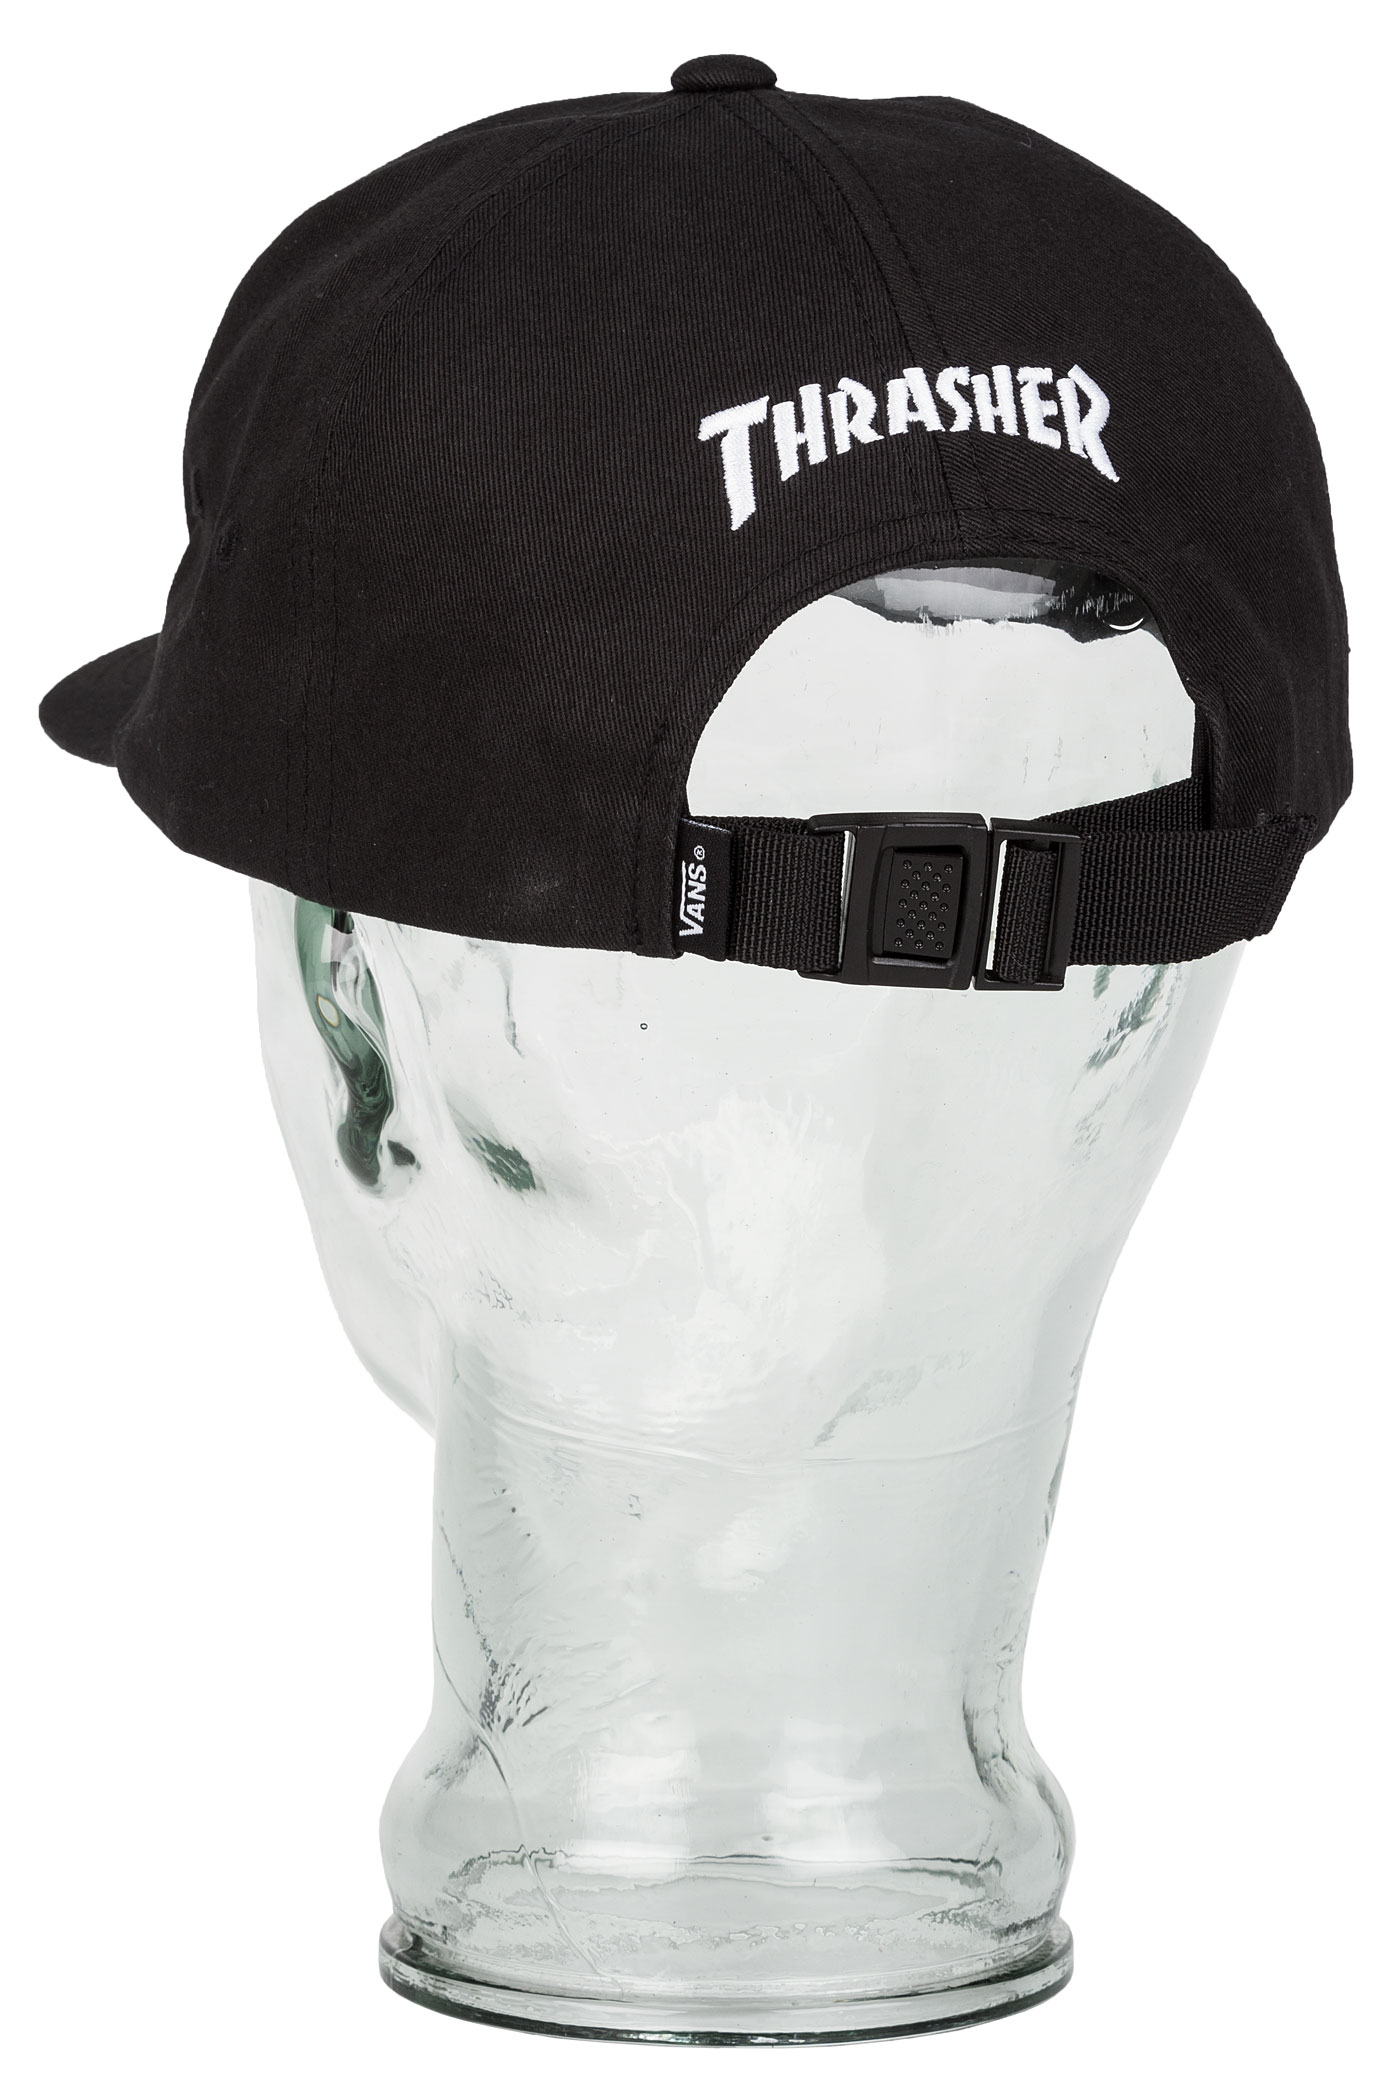 Vans x Thrasher Jockey Cap (black) buy at skatedeluxe fa6291f4c5c